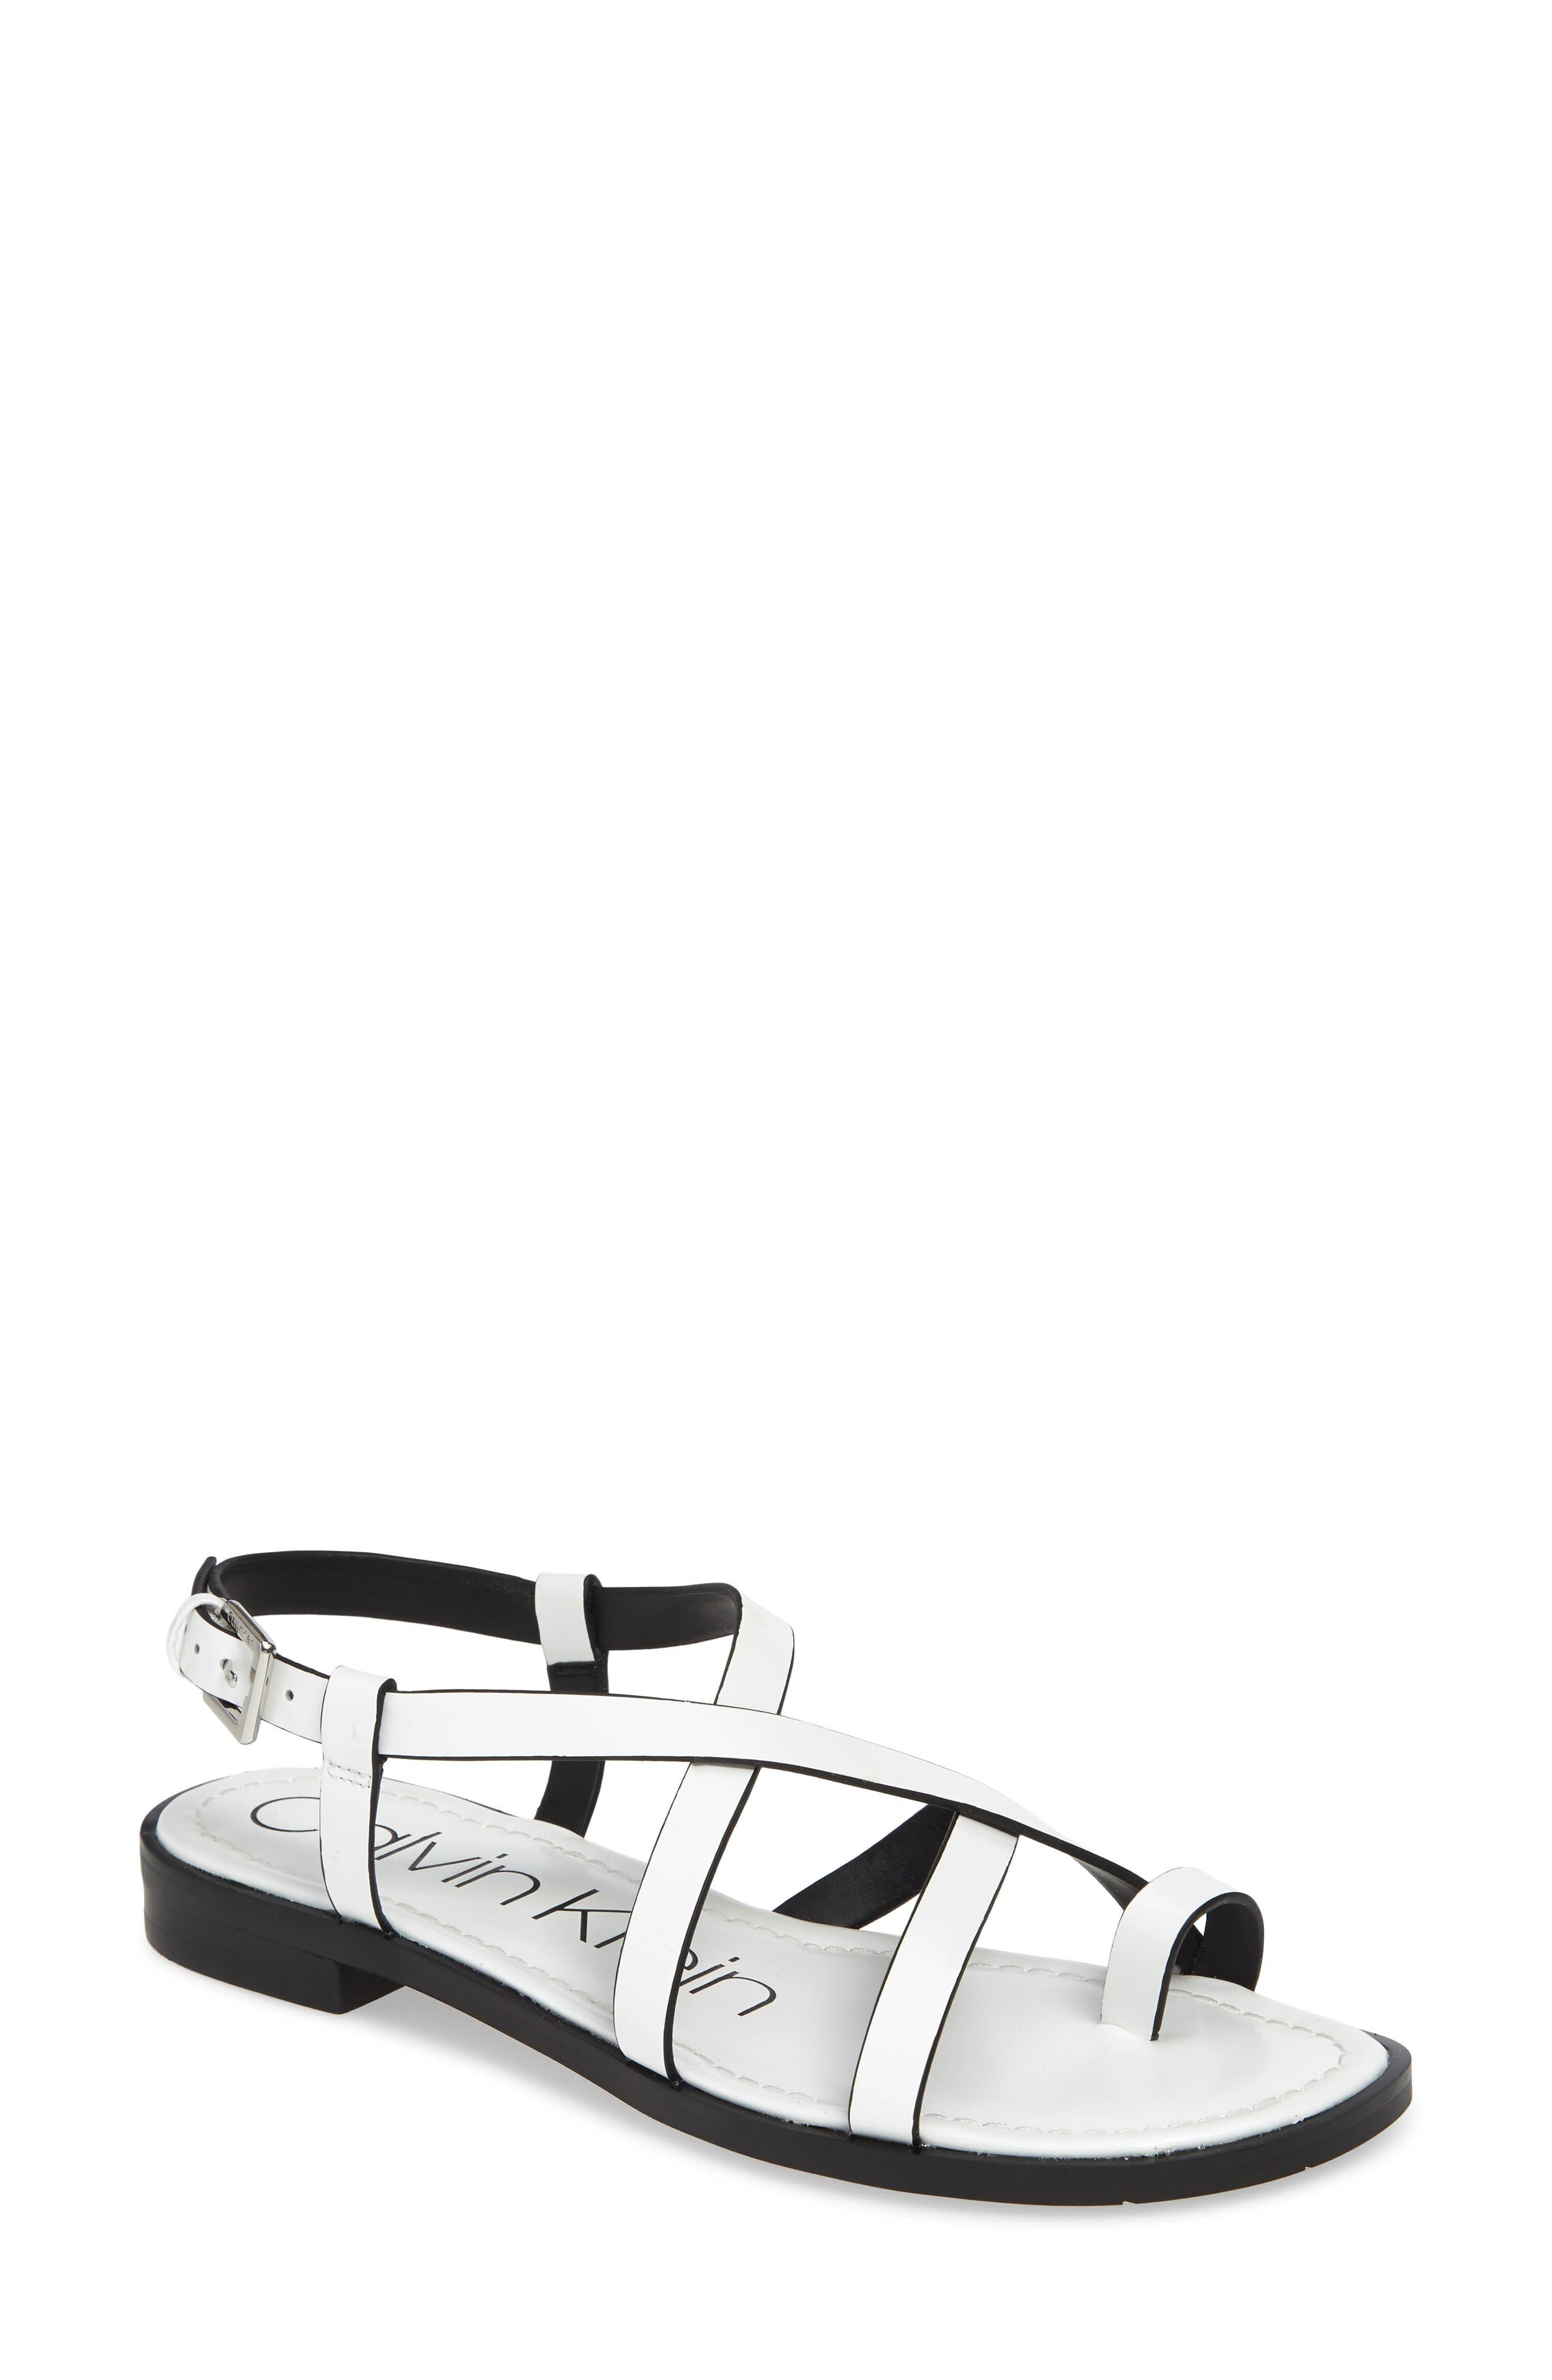 Calvin Klein Tica Sandal, White